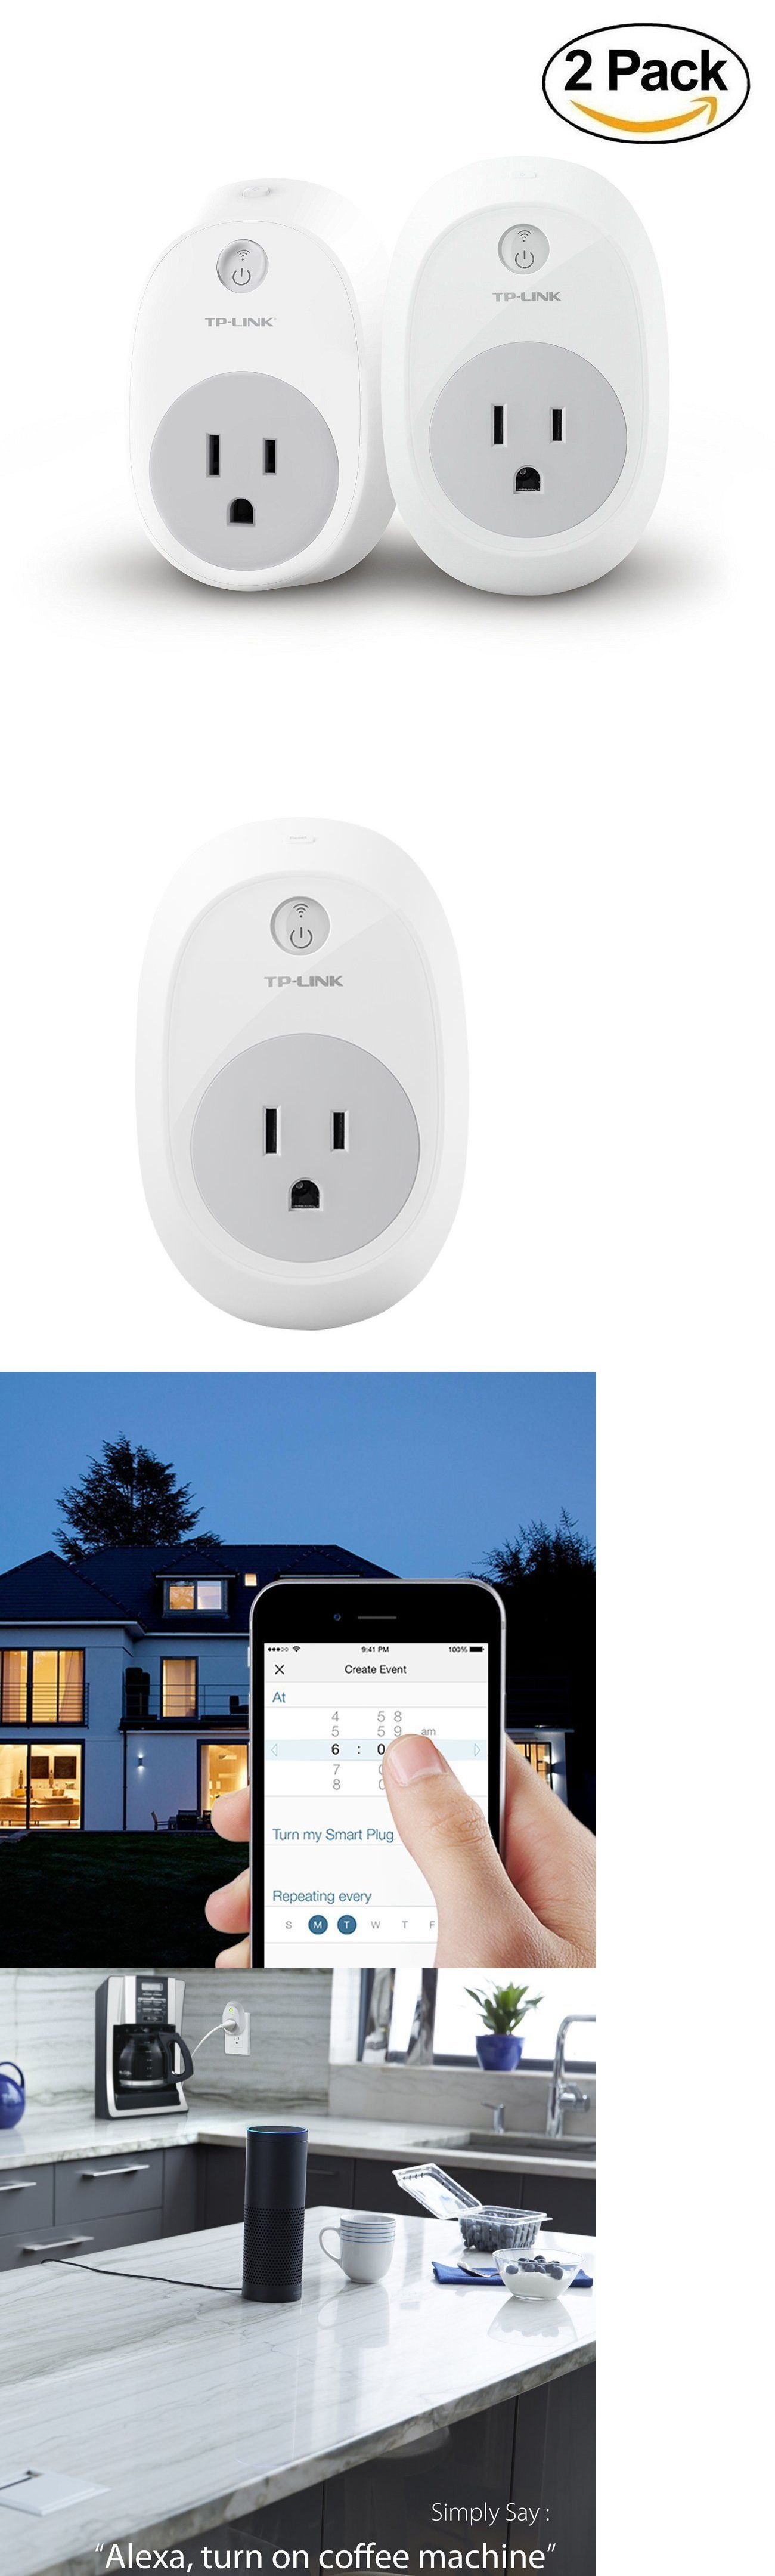 Home Automation Modules: Tp-Link Smart Home Plug Outlet No Hub Wi-Fi ...